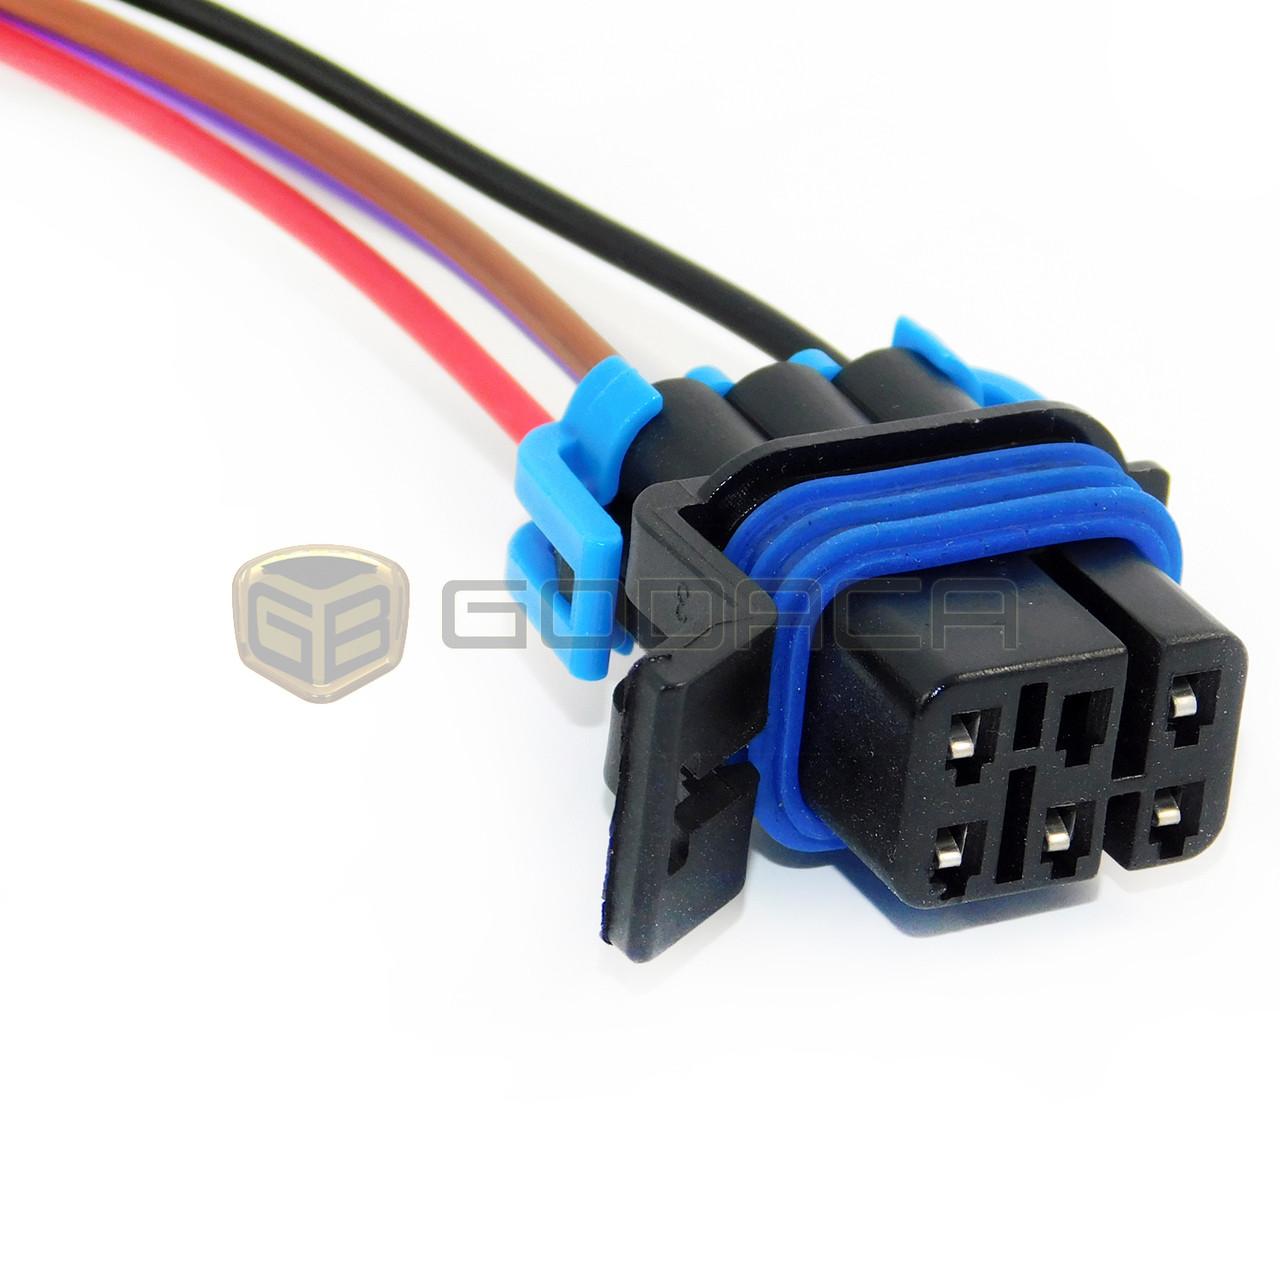 connector fuel pump sensor harness pigtail fpw4-gmc buick pontiac chevrolet  - godaca, llc